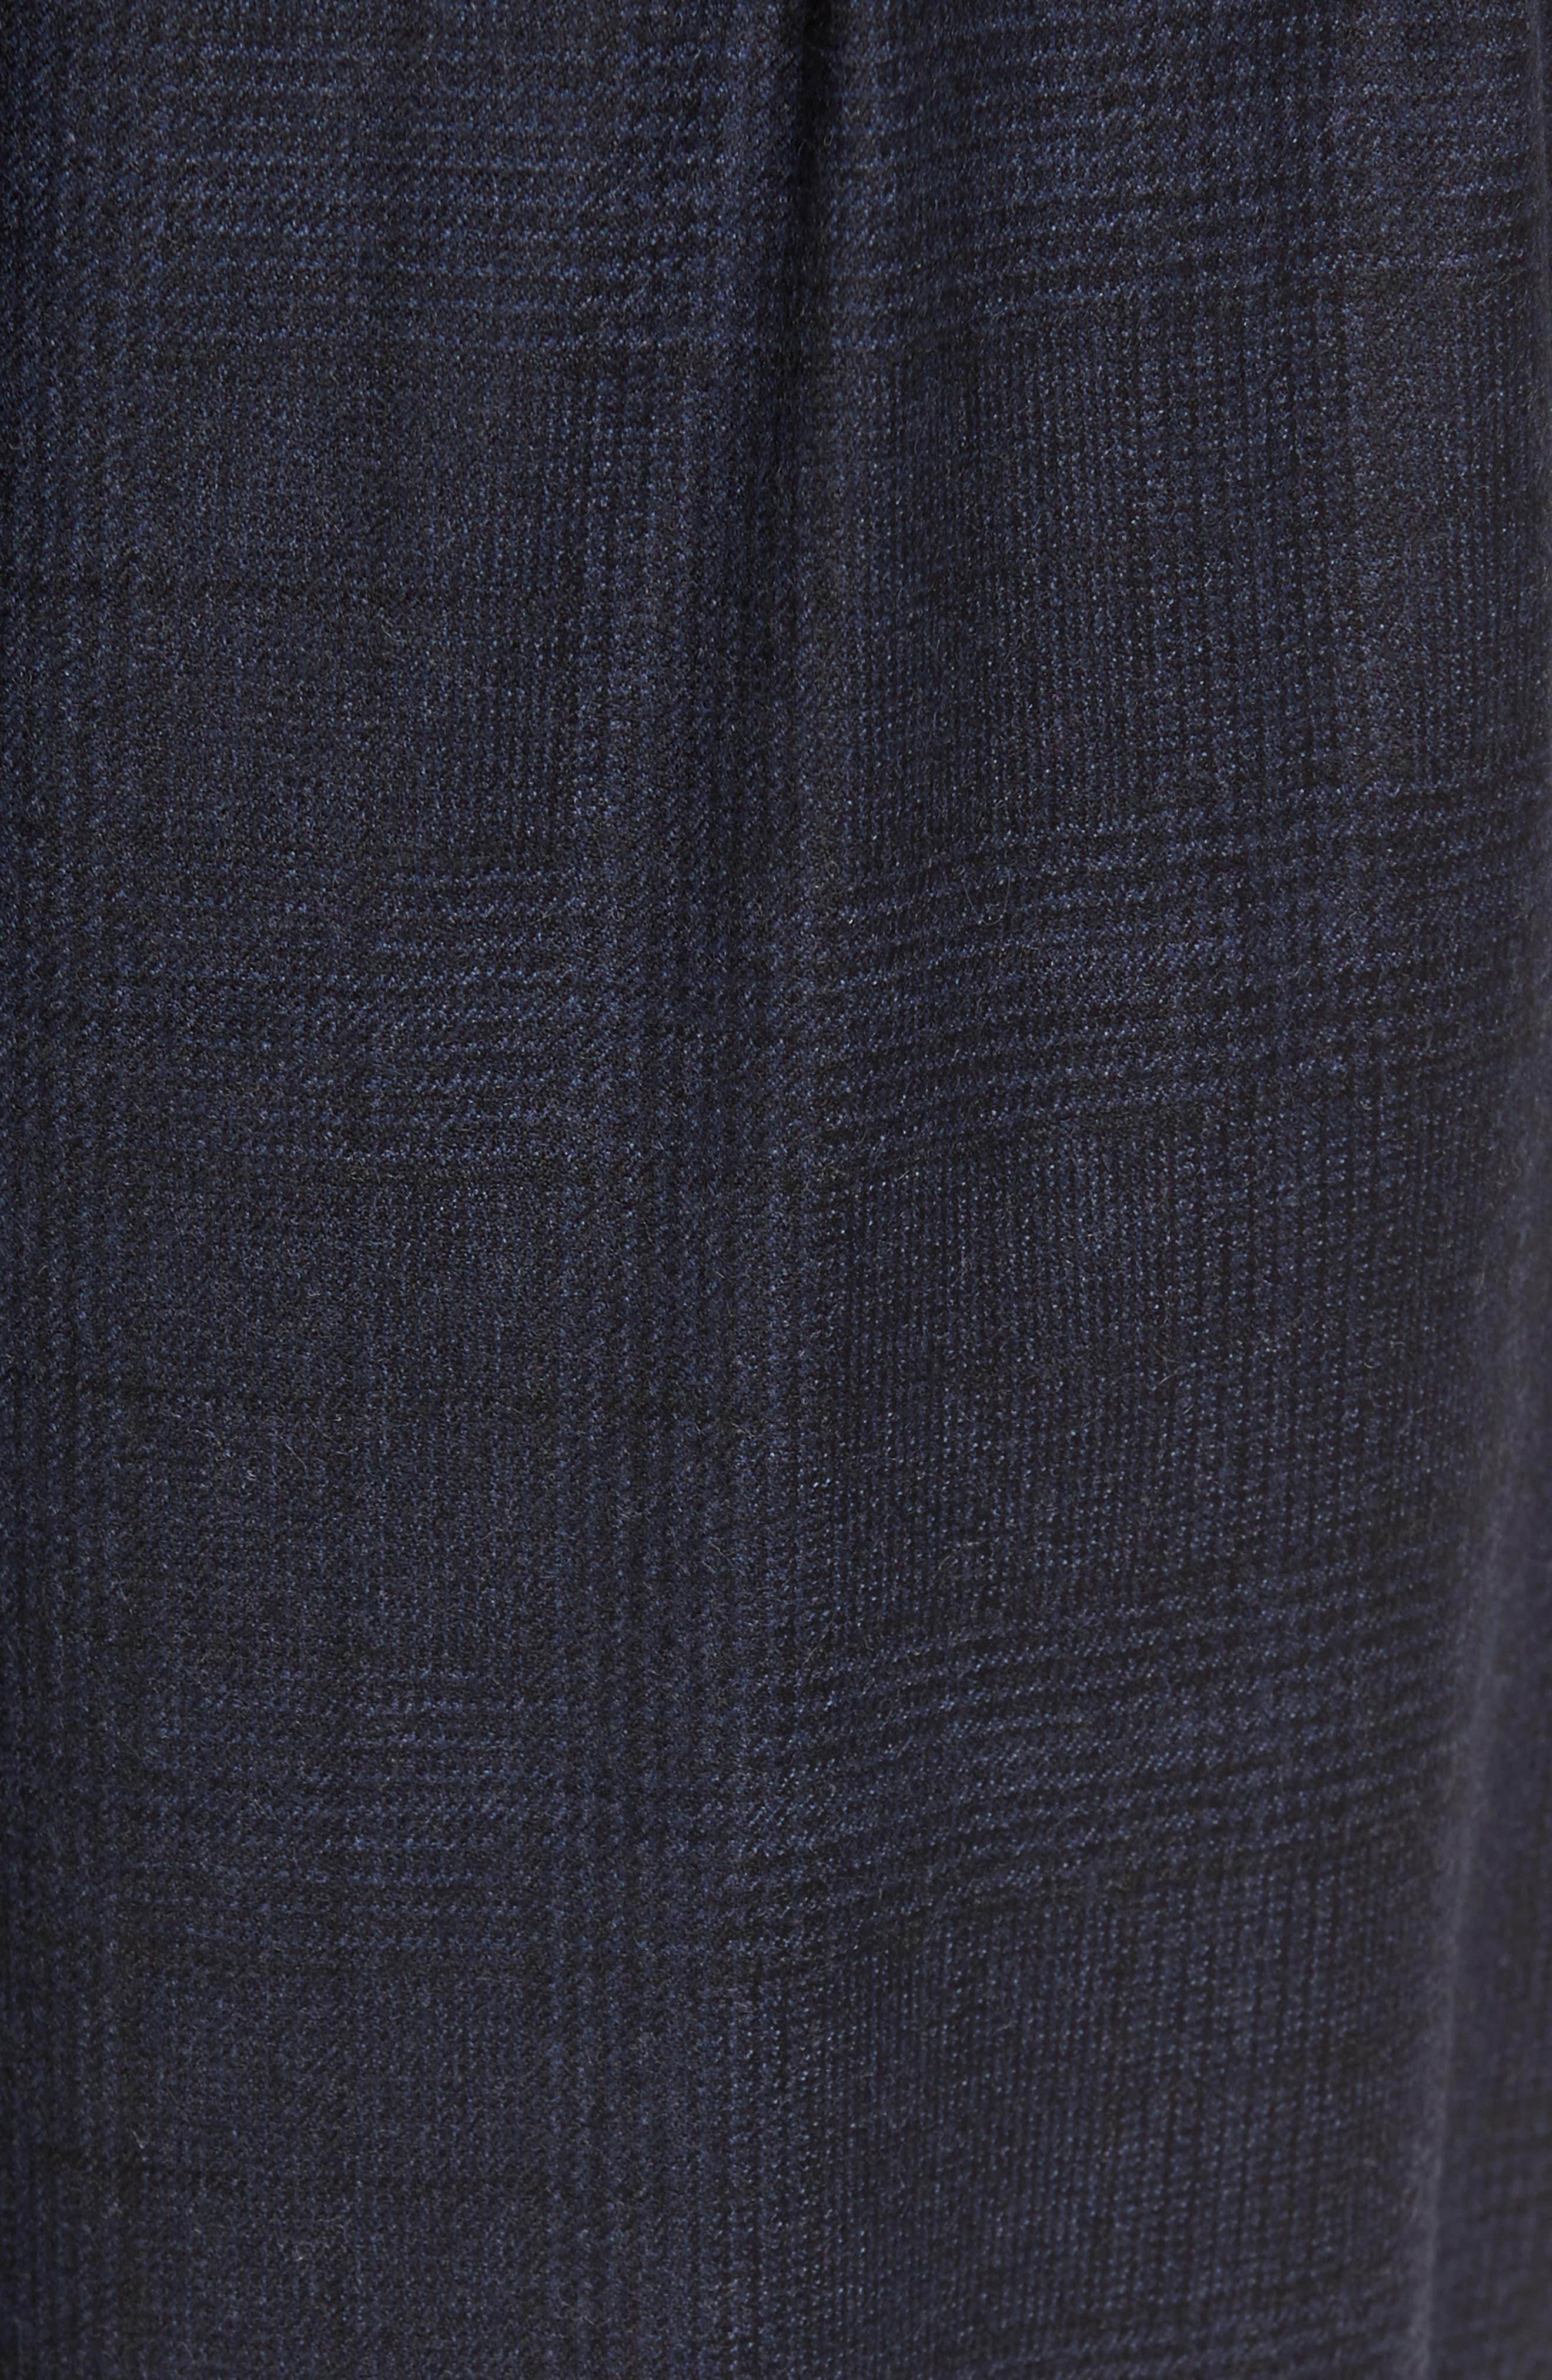 Glen Plaid Pleat Front Wool Pants,                             Alternate thumbnail 5, color,                             Navy